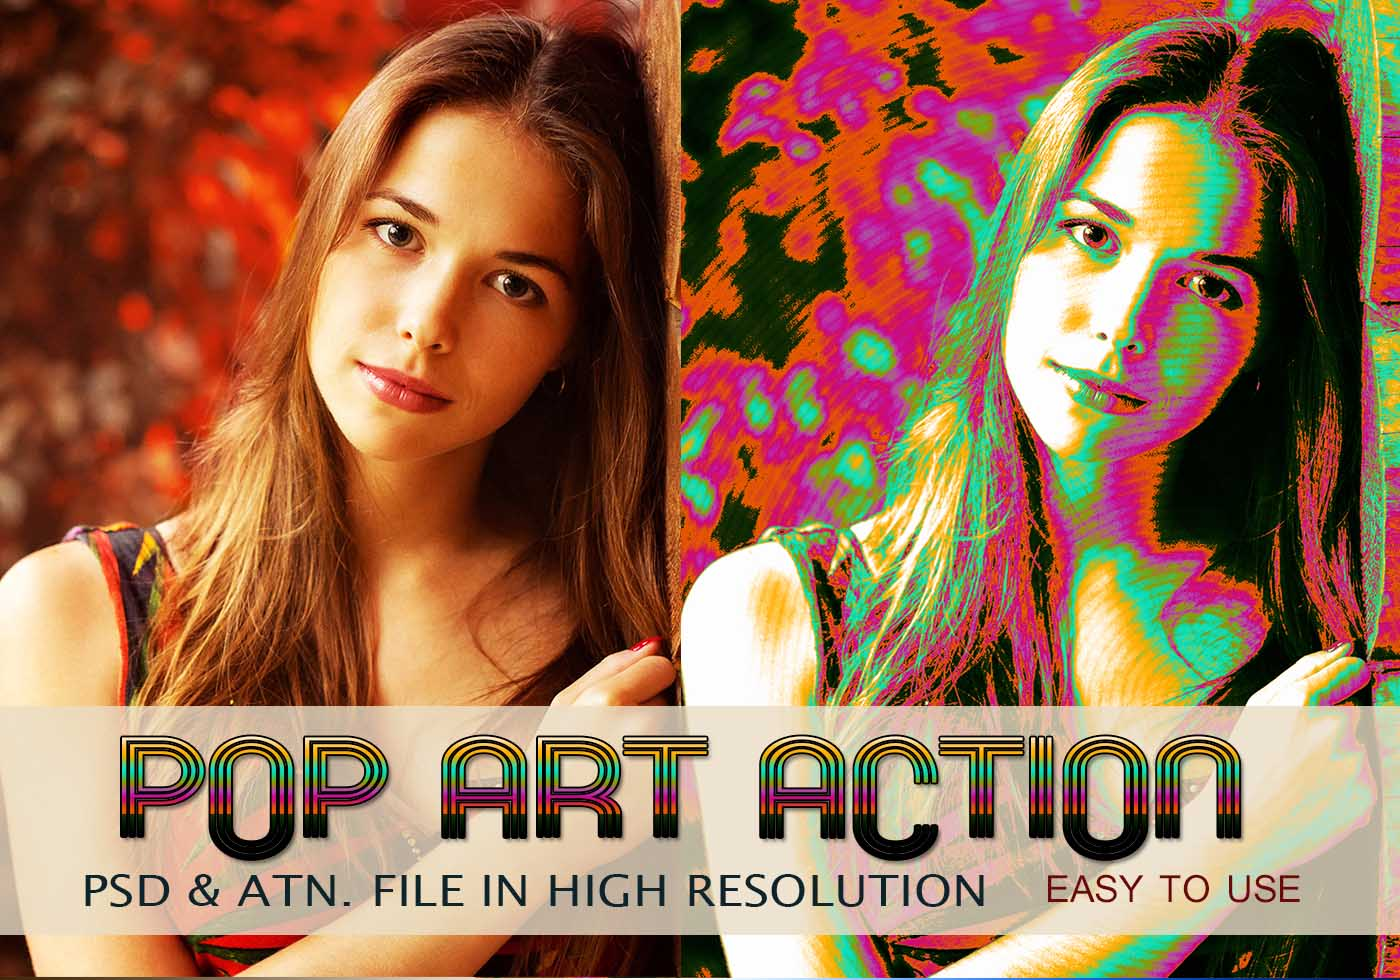 Pop art photoshop pdf converter